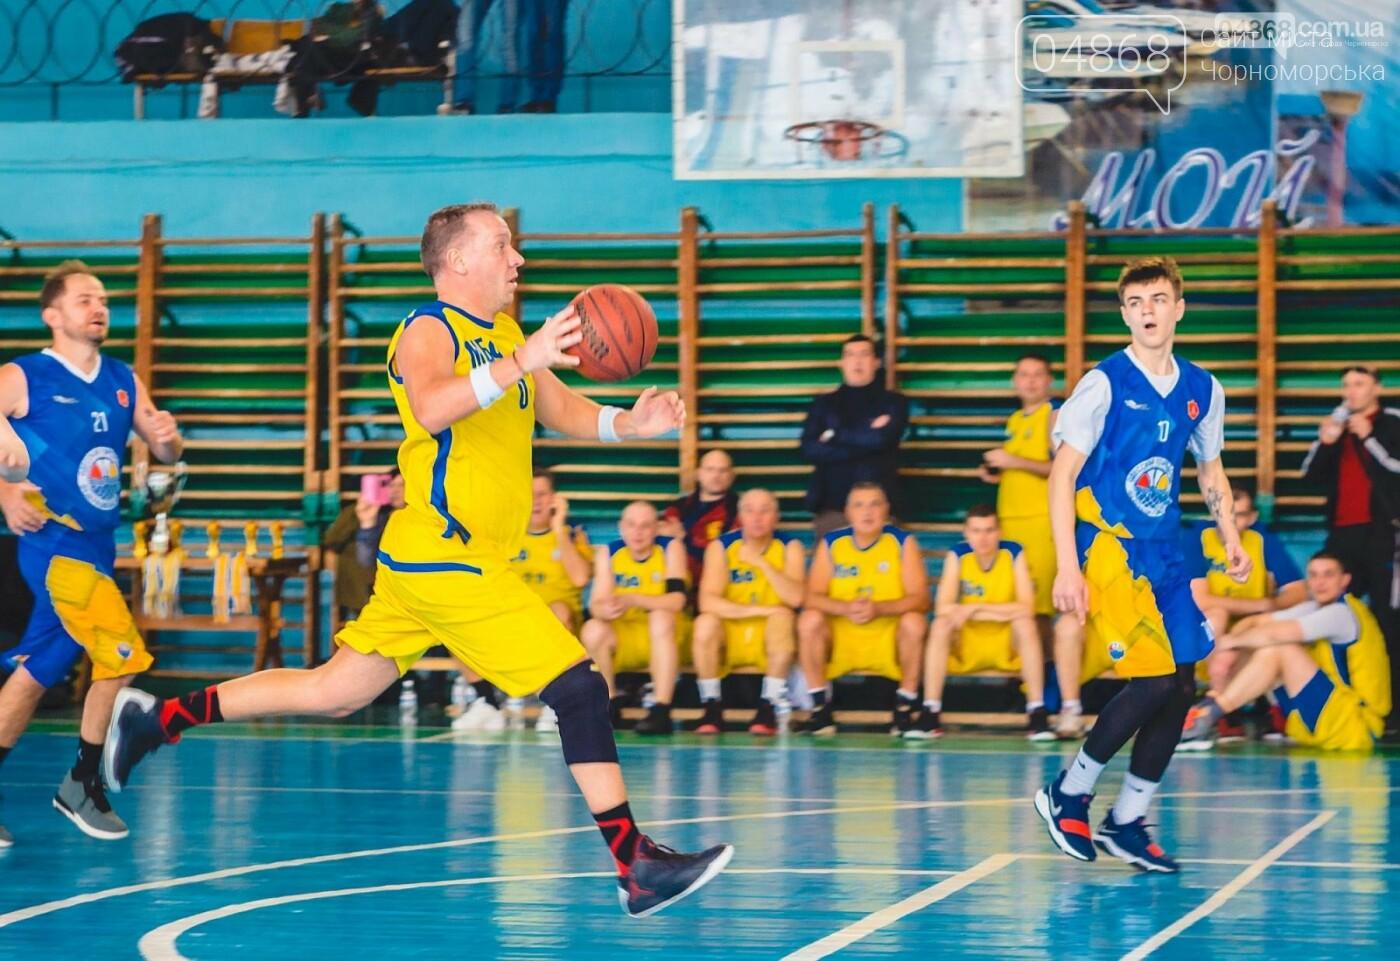 Городской голова поздравил победителей Чемпионата Черноморска по баскетболу (+ФОТО), фото-5